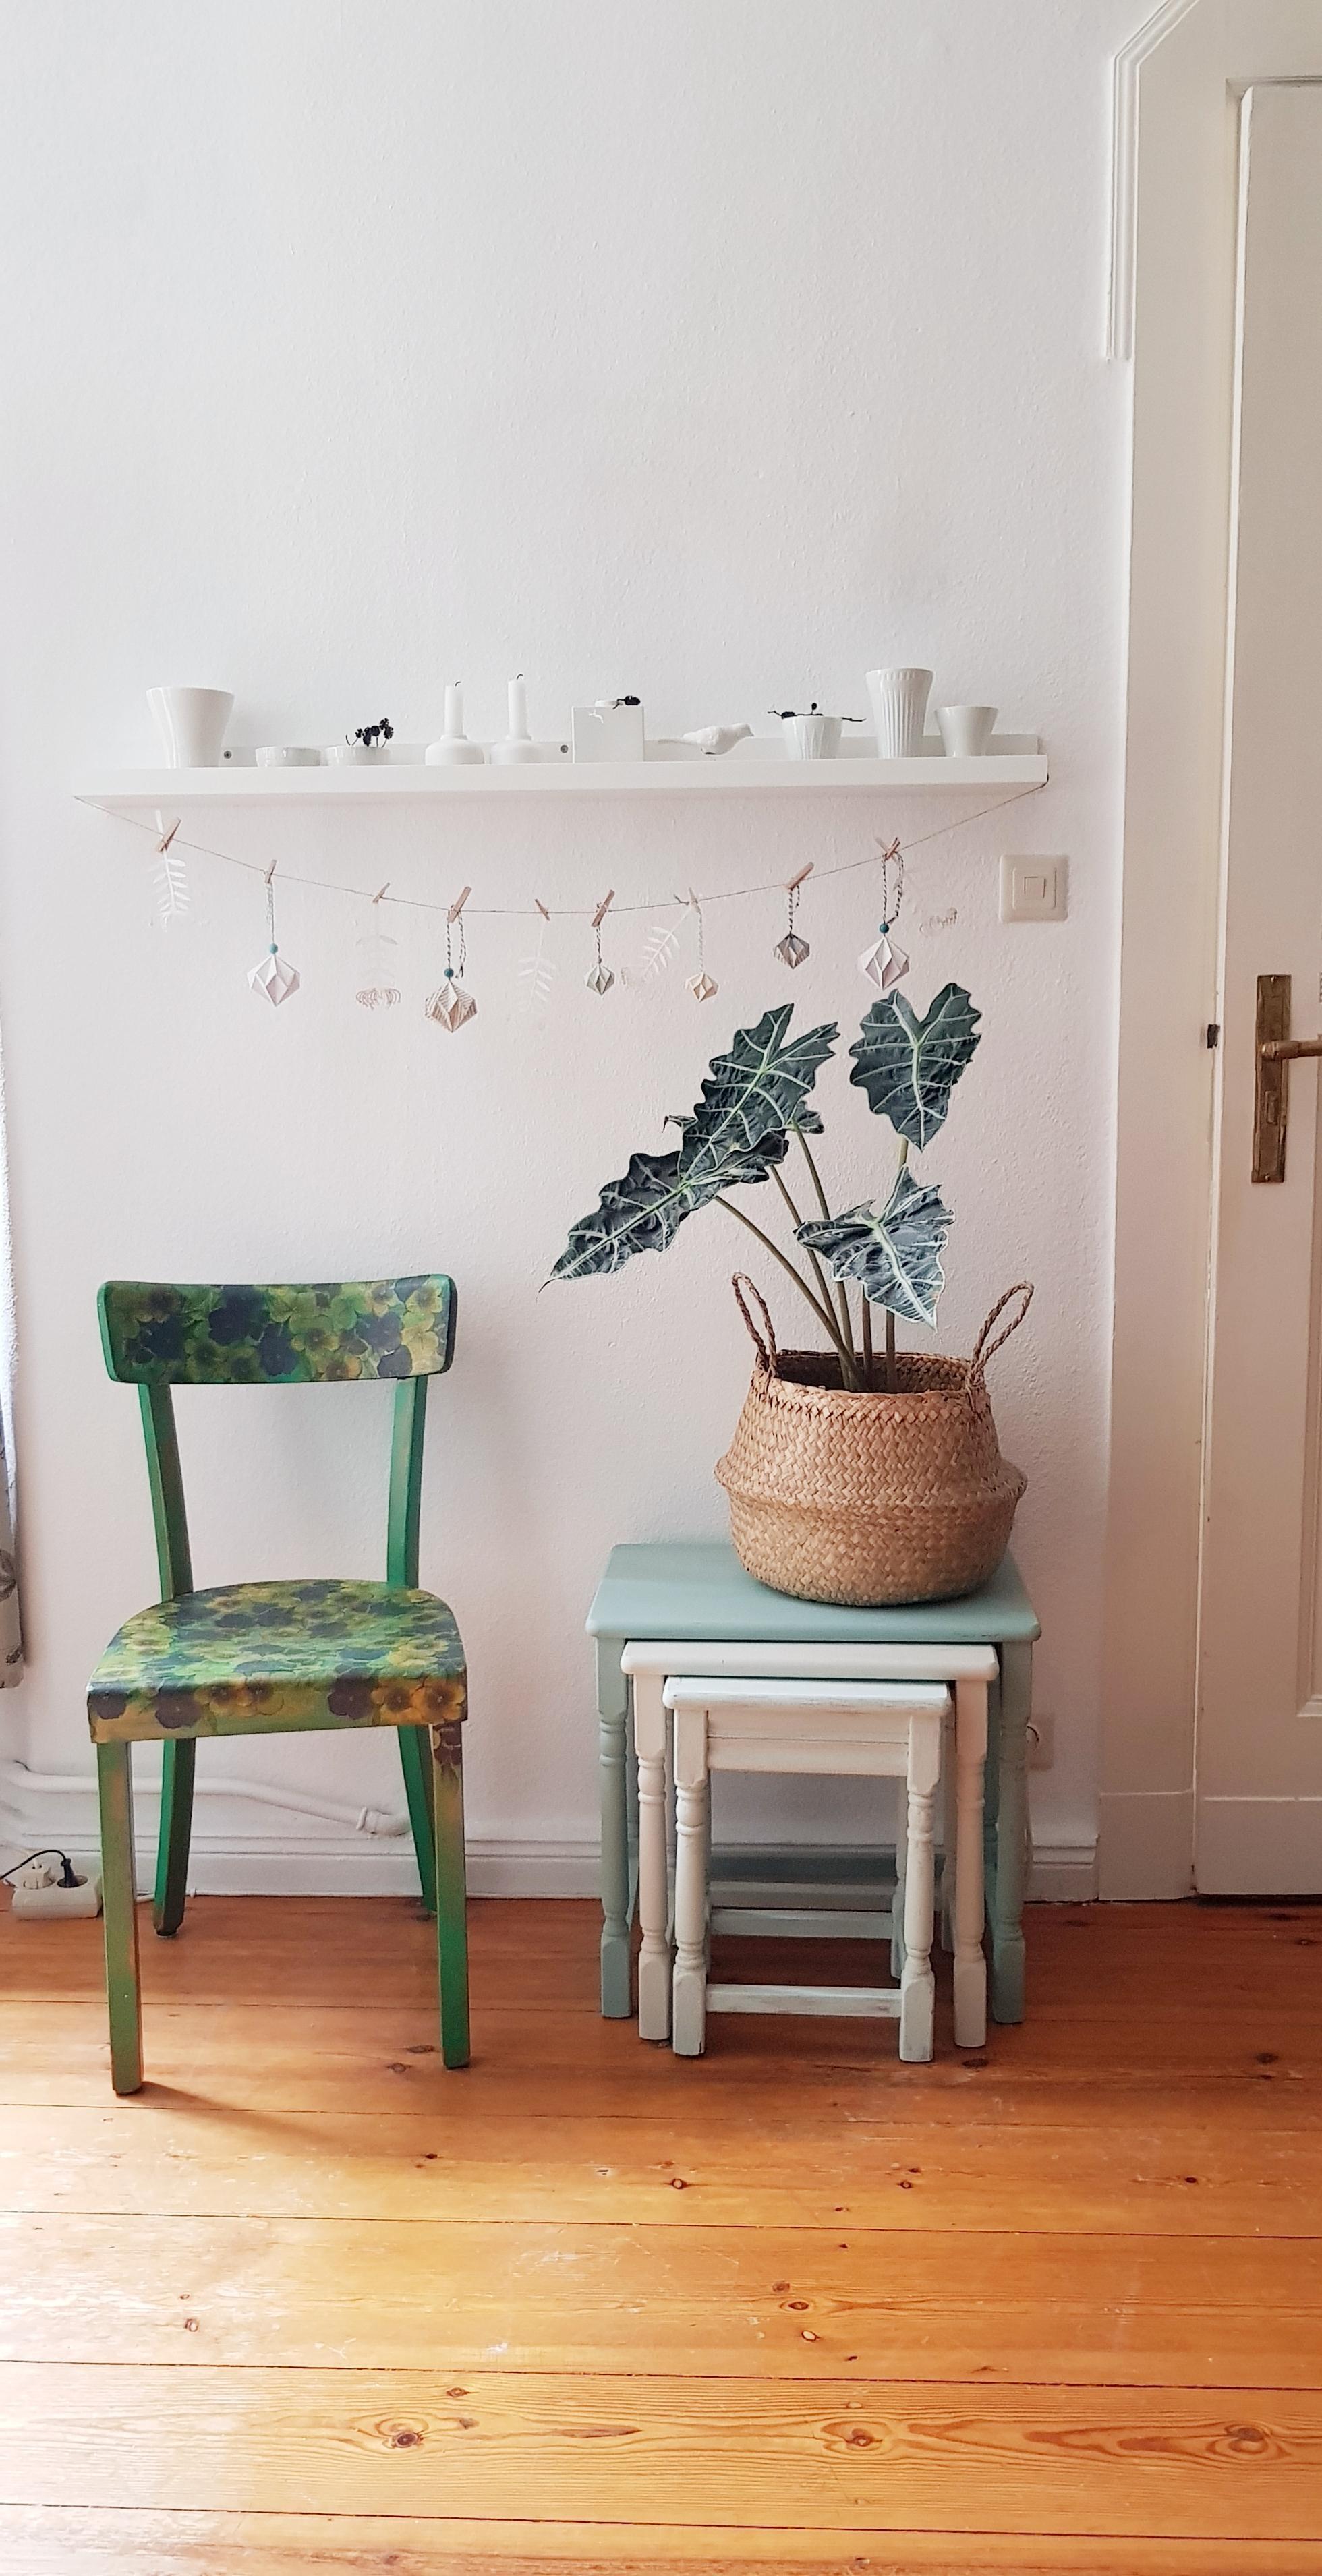 Design stuhl esszimmer finest sta hle stuhle esszimmer for Stuhl design esszimmer